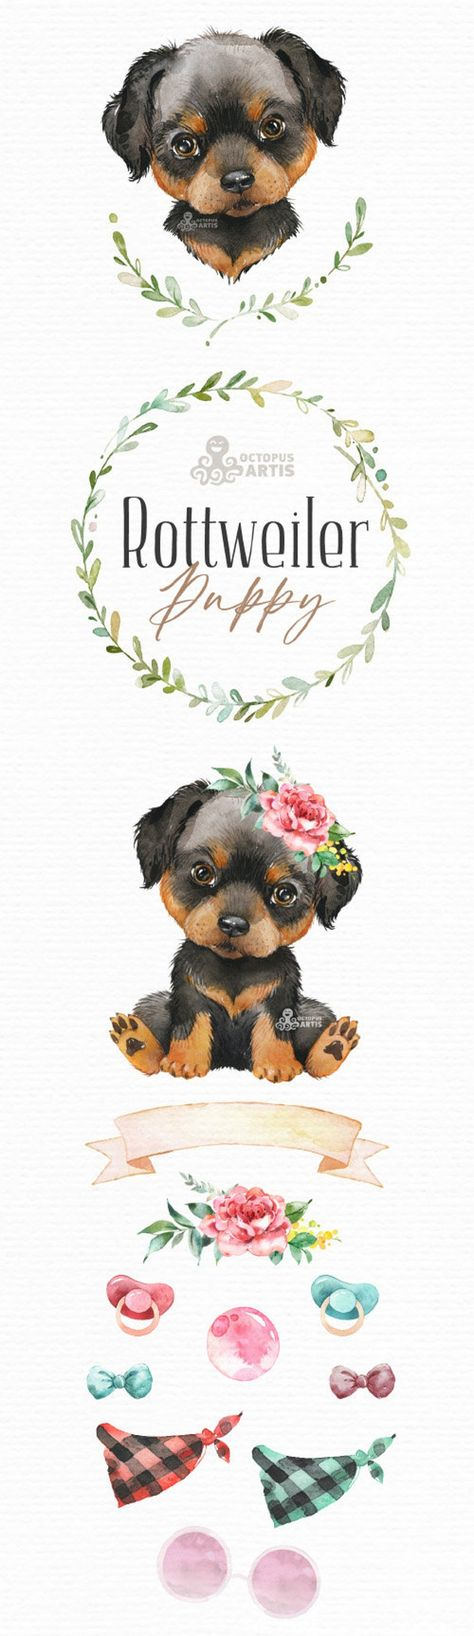 Rottweiler. Watercolor little animal clipart, portrait, puppy, doggie, baby, flowers, kids nursery,